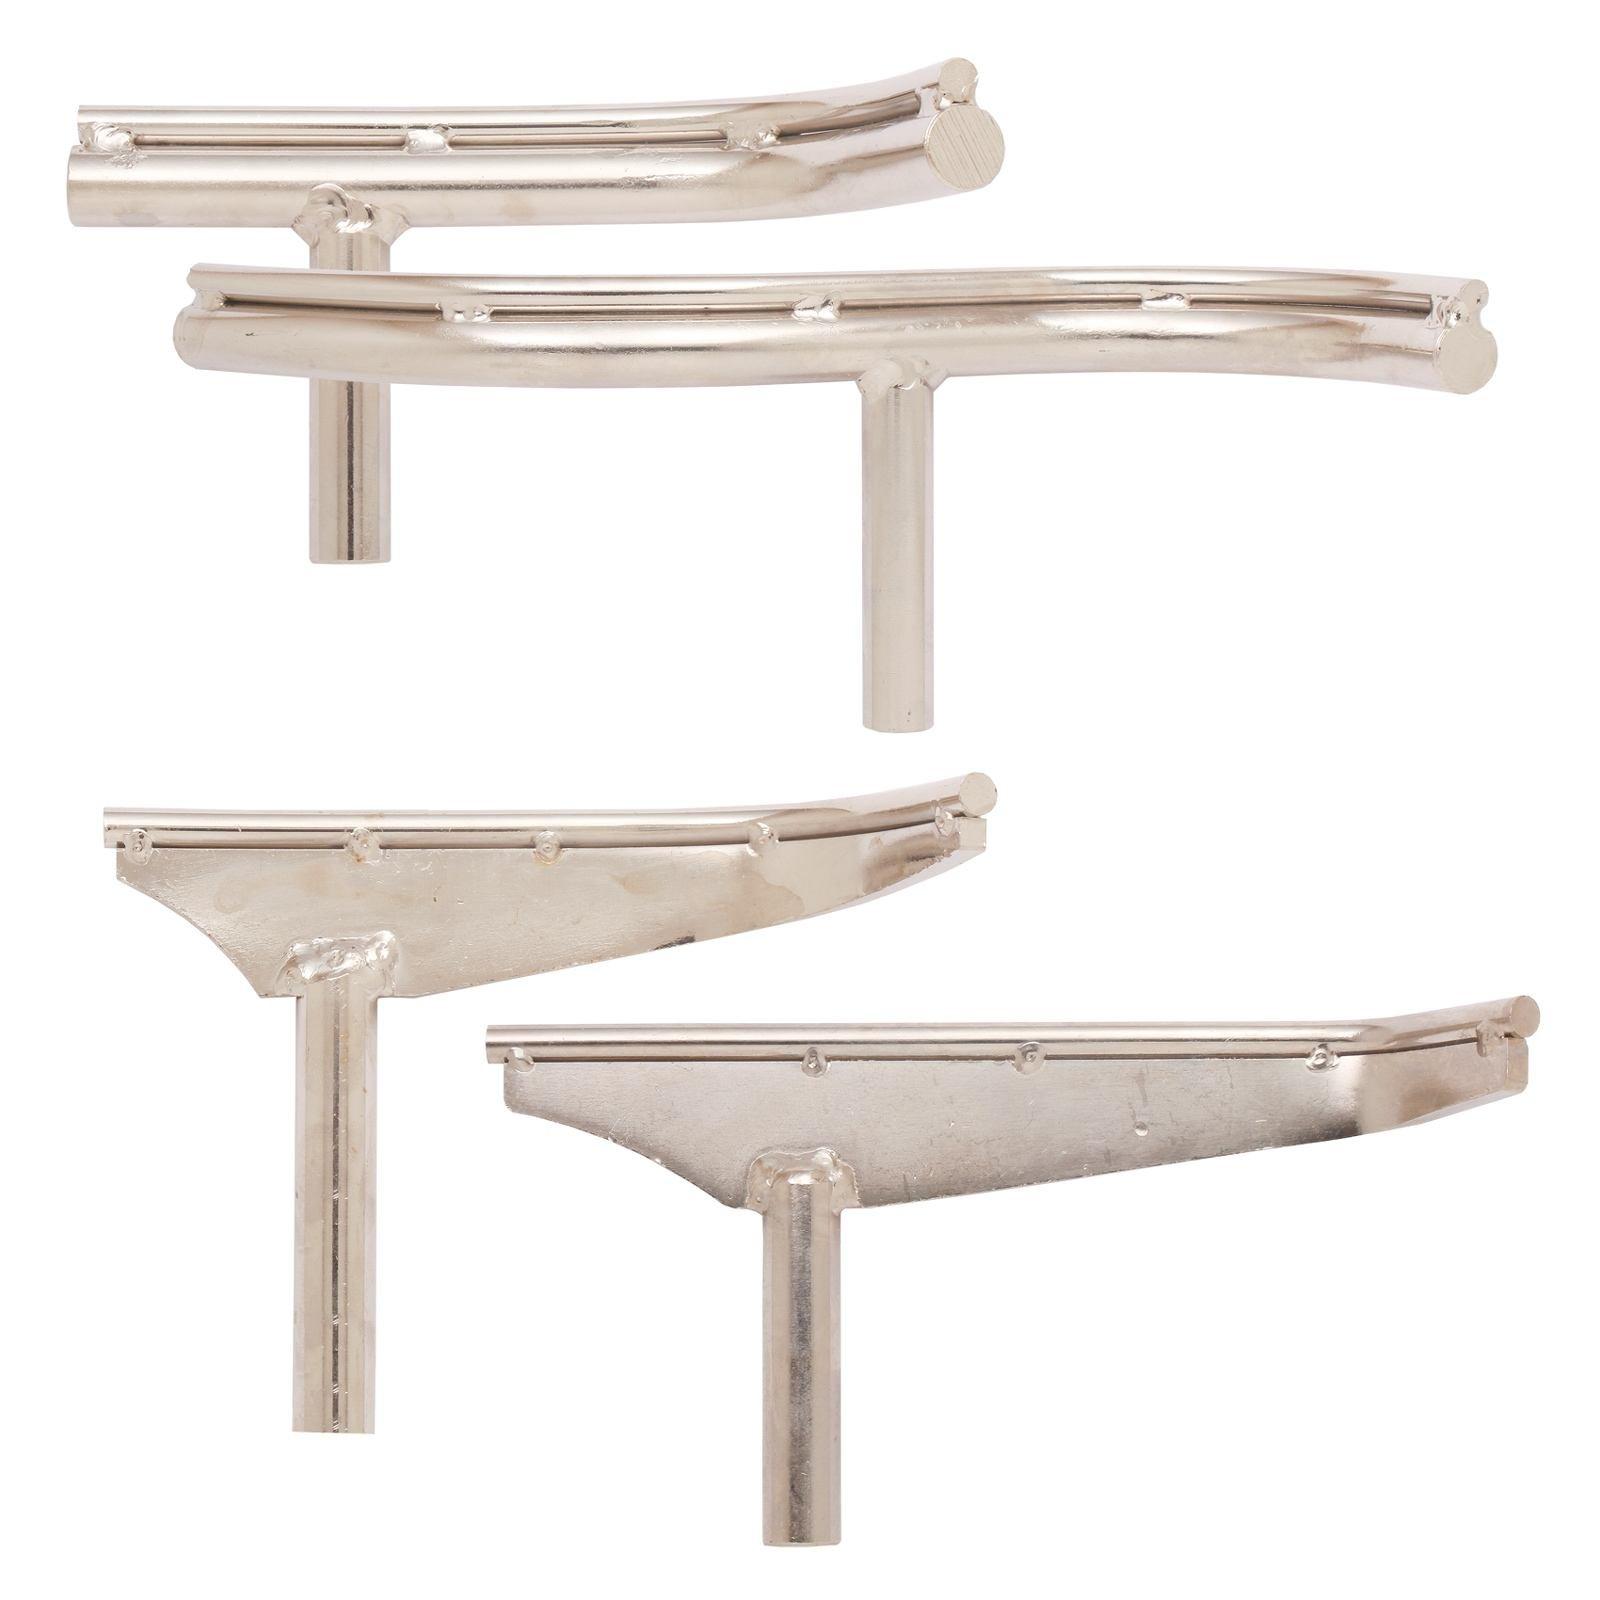 PSI Woodworking CLTEZSETC EZ-Glide Bowl Turner's 4Piece Toolrest Set